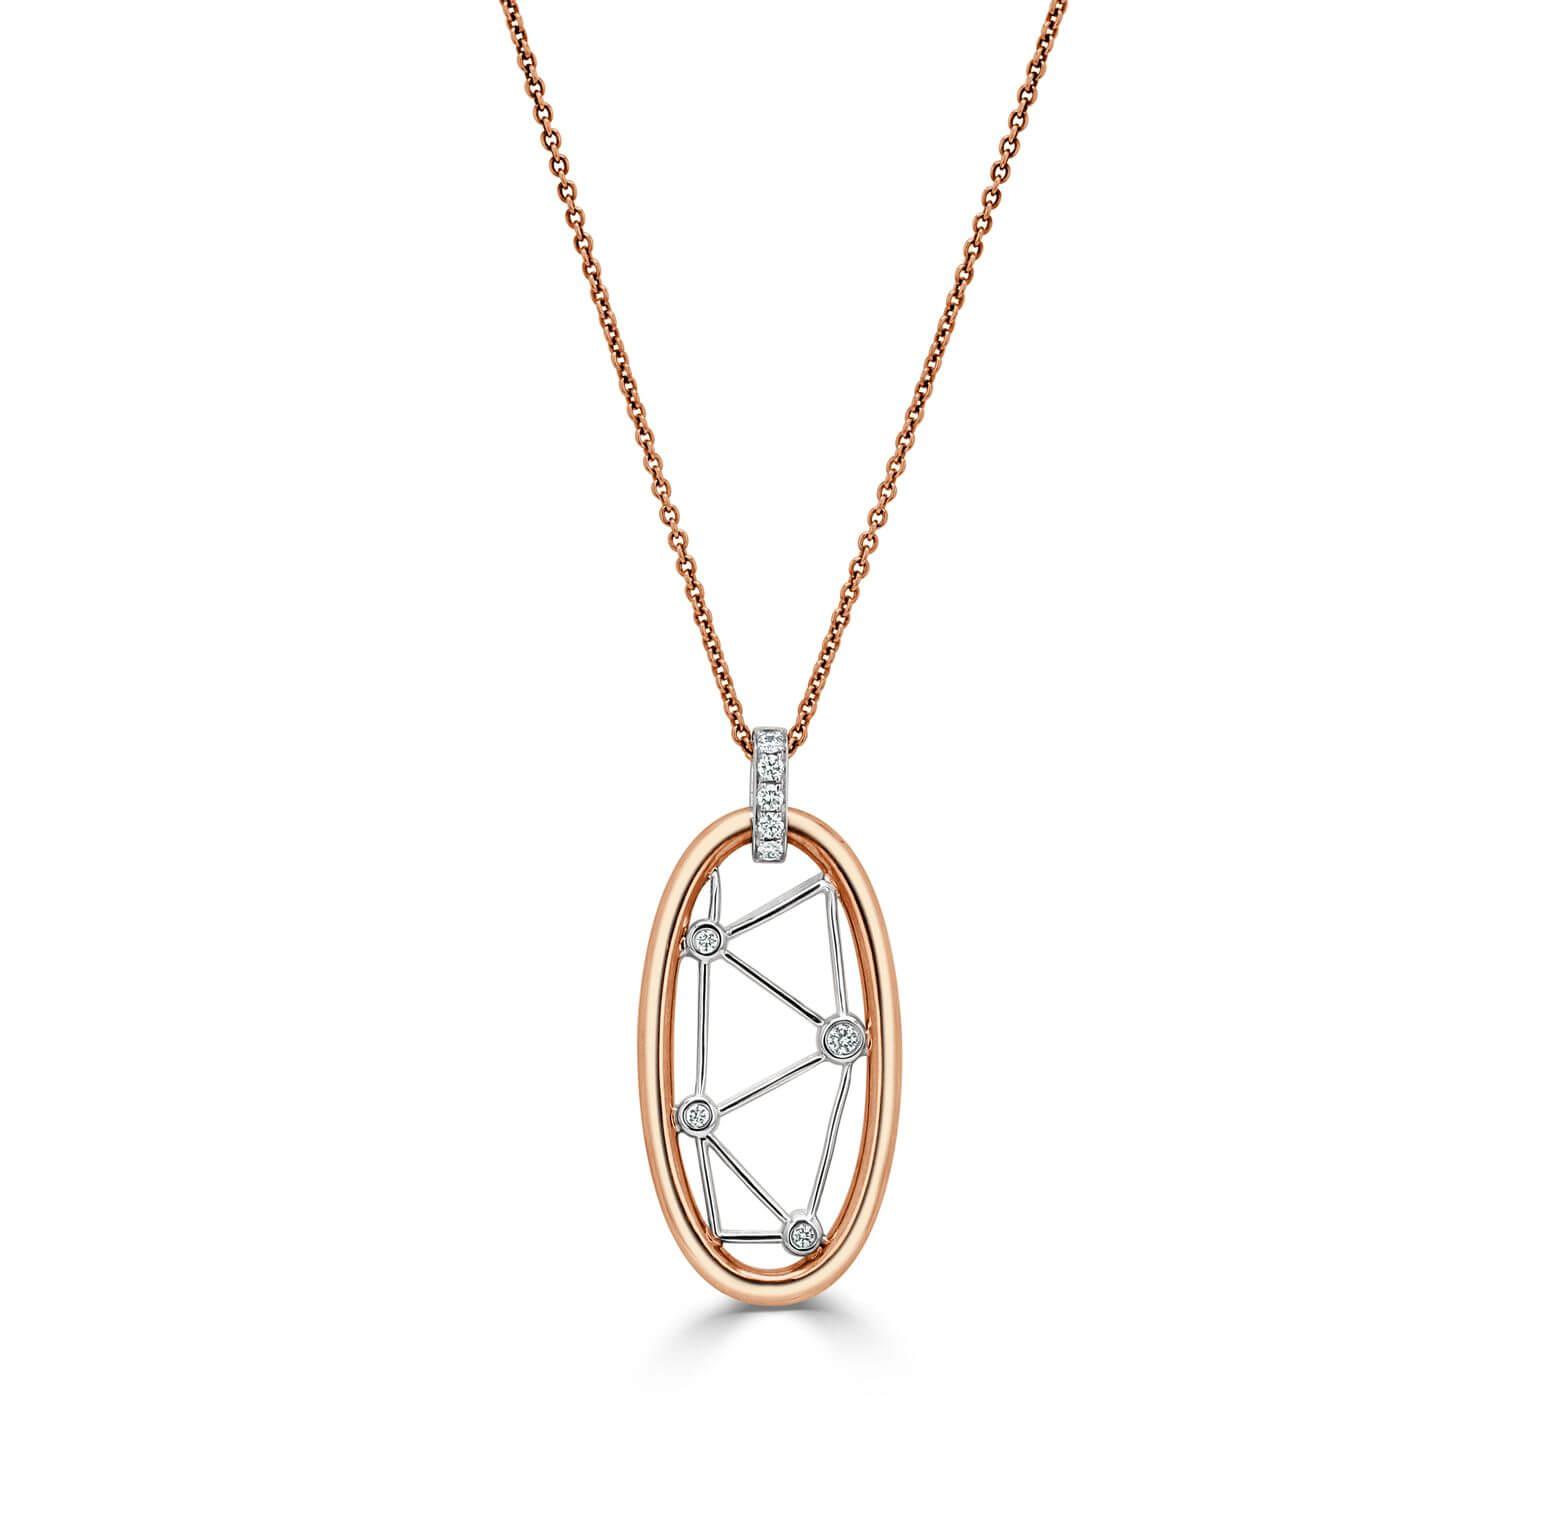 18ct Rose Gold Constellation Diamond Pendant